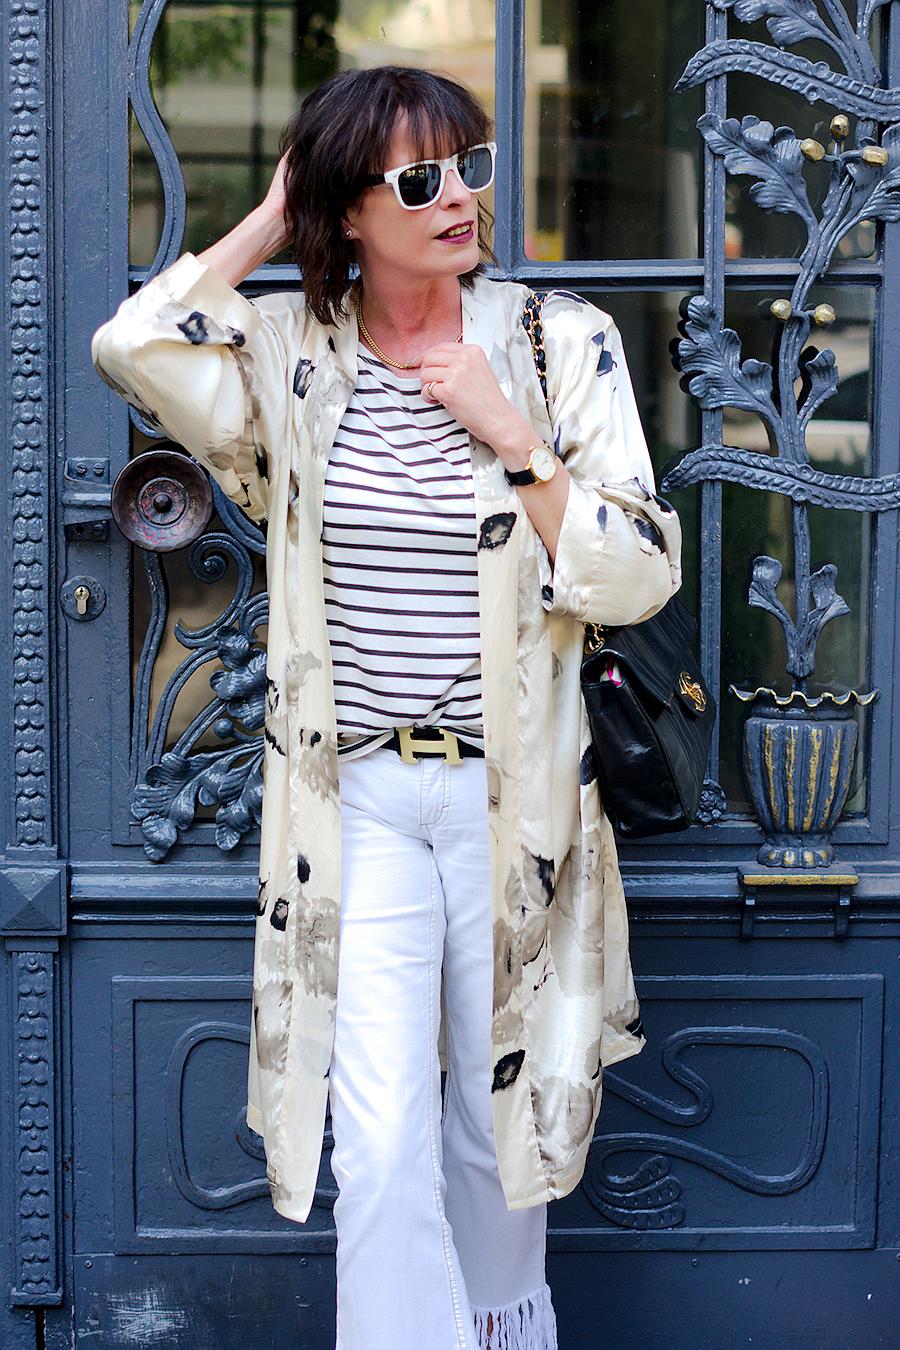 Just-take-a-look.berlin - Silk & Denim-Outfit